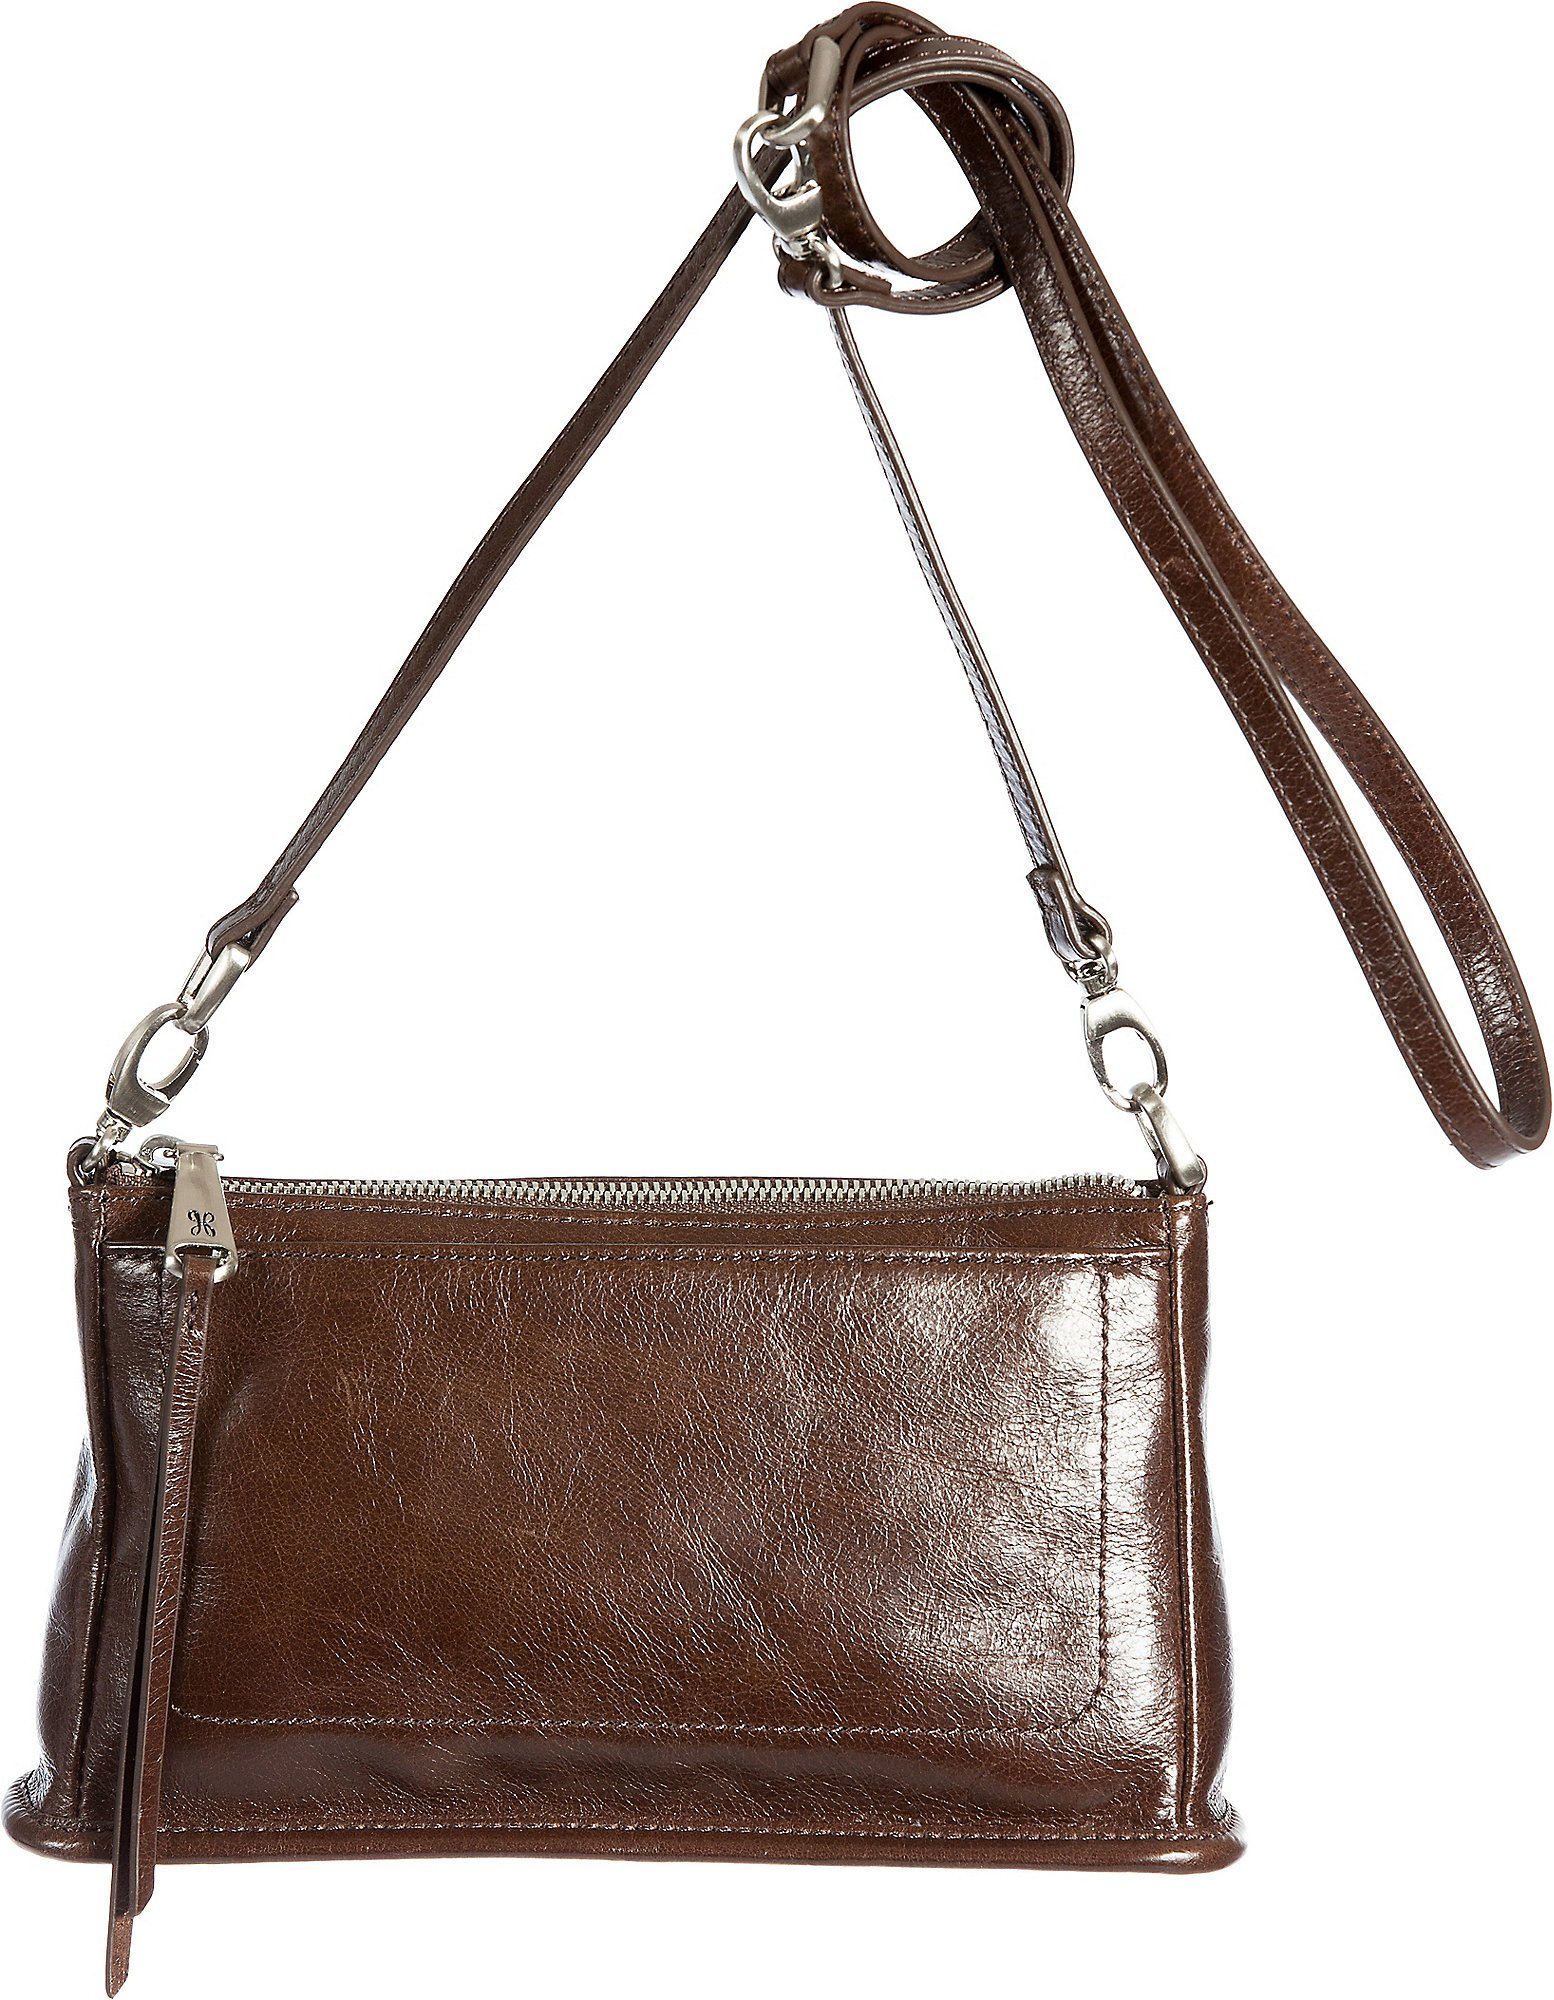 Hobo Women's Vintage Cadence Convertible Crossbody Bag (Espresso)